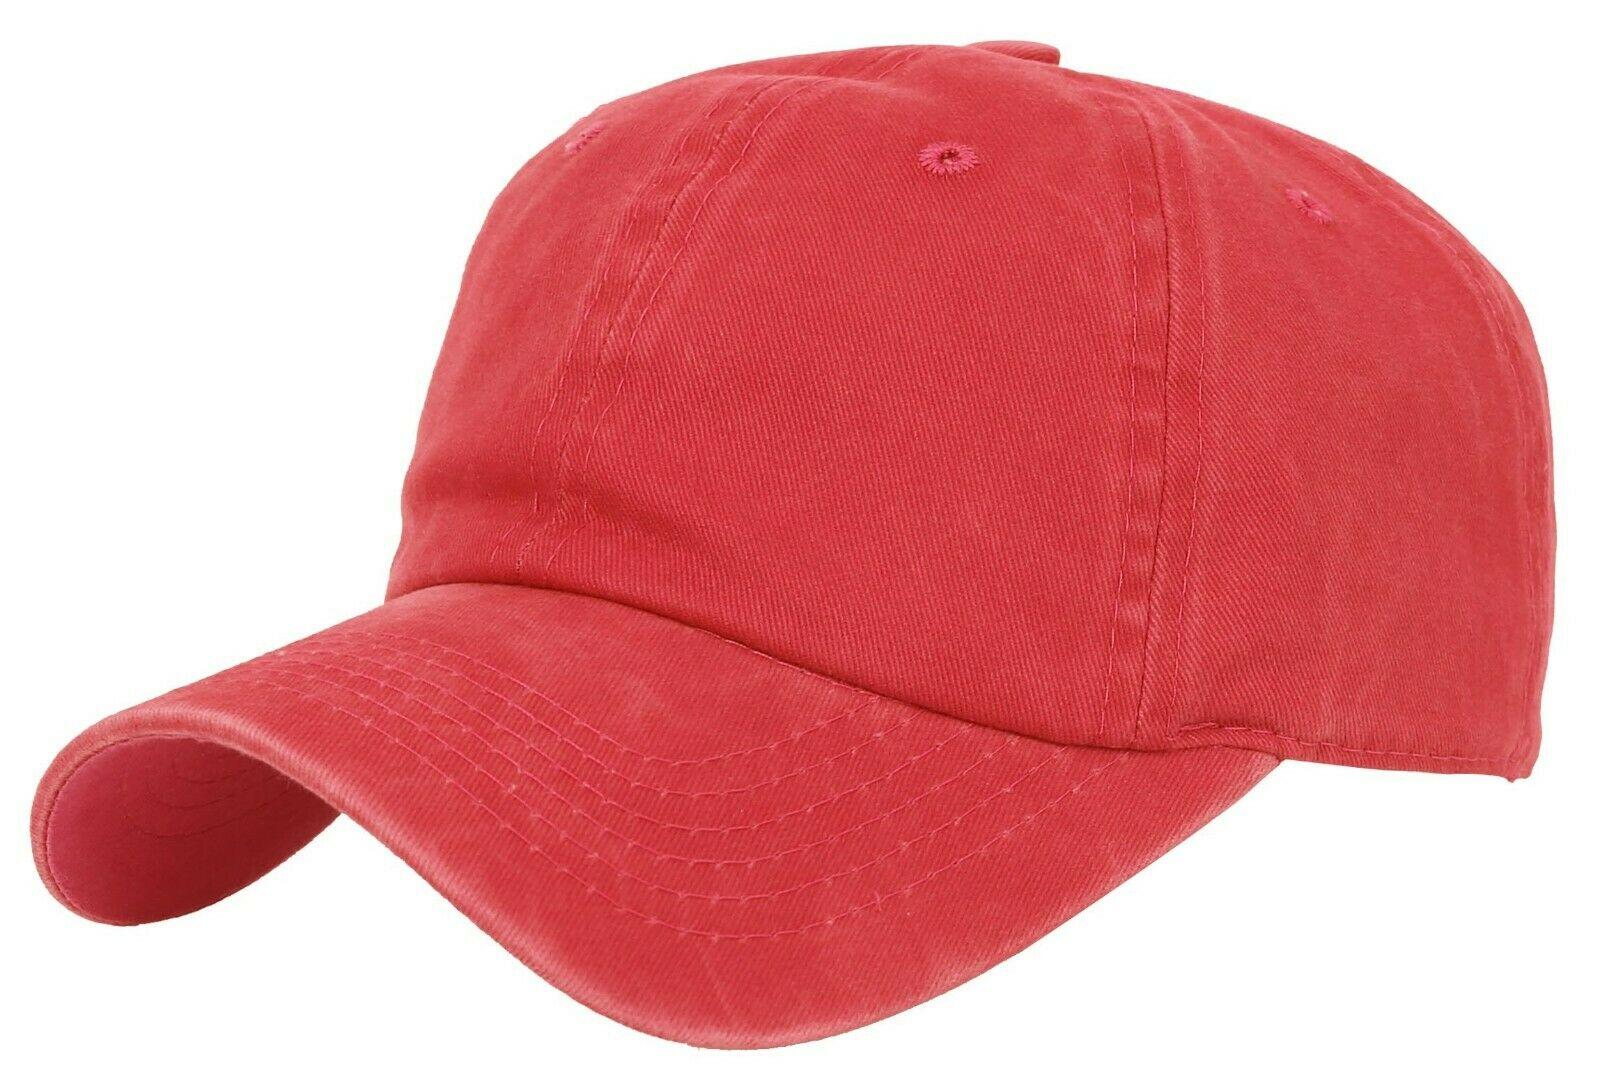 BASEBALL-CAP-Plain-Dad-Hat-Low-Profile-Vintage-Washed-Pigment-Adjustable thumbnail 16